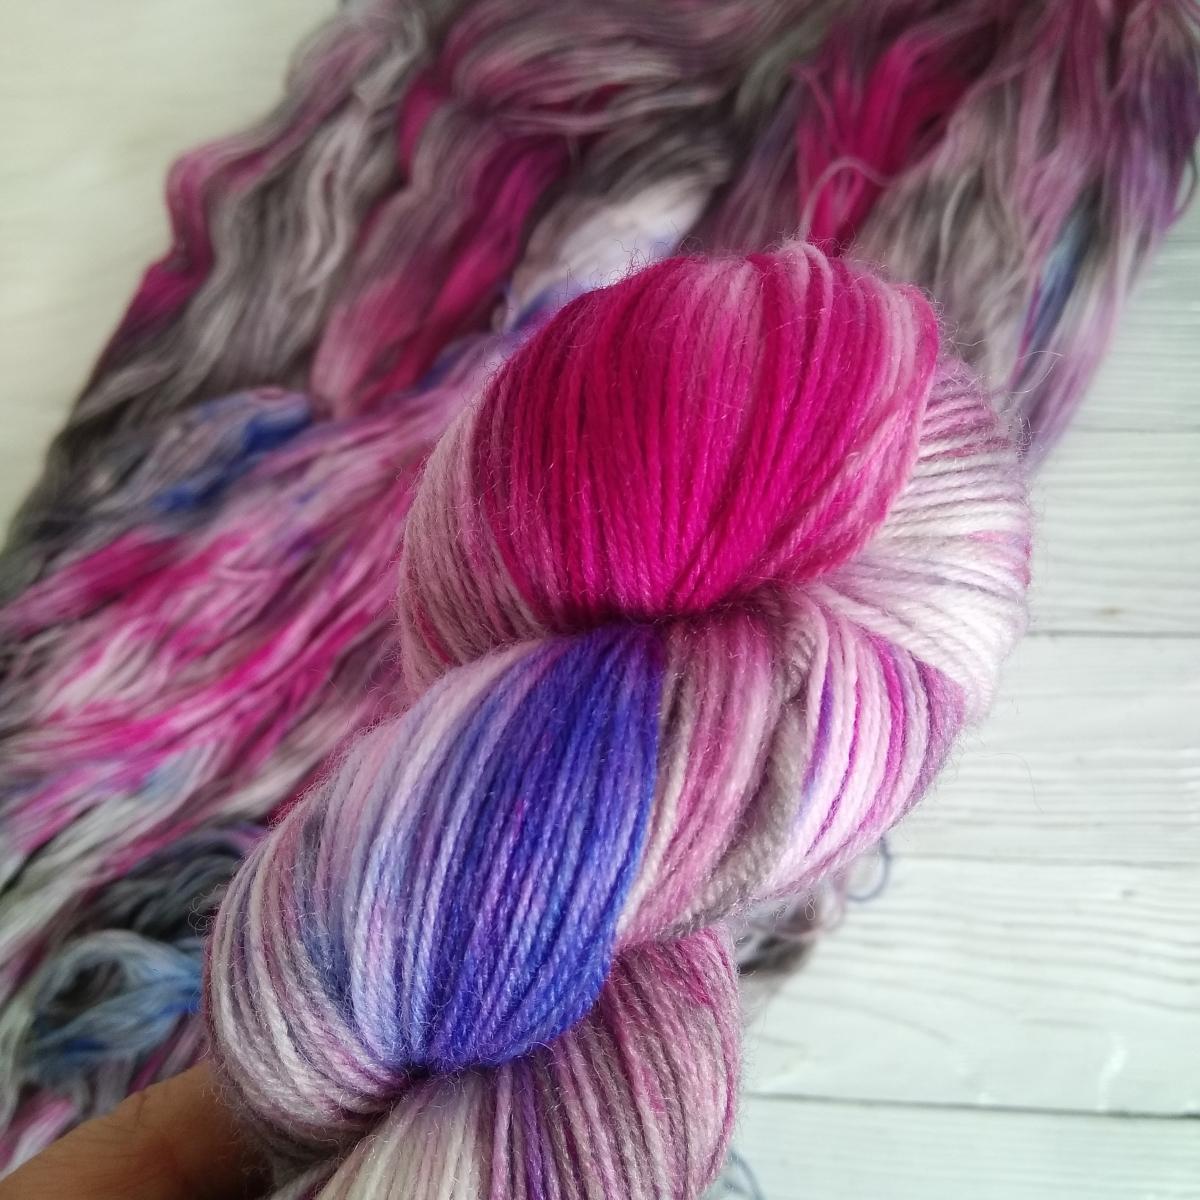 woodico.pro hand dyed yarn 034 1200x1200 - Hand dyed yarn / 034